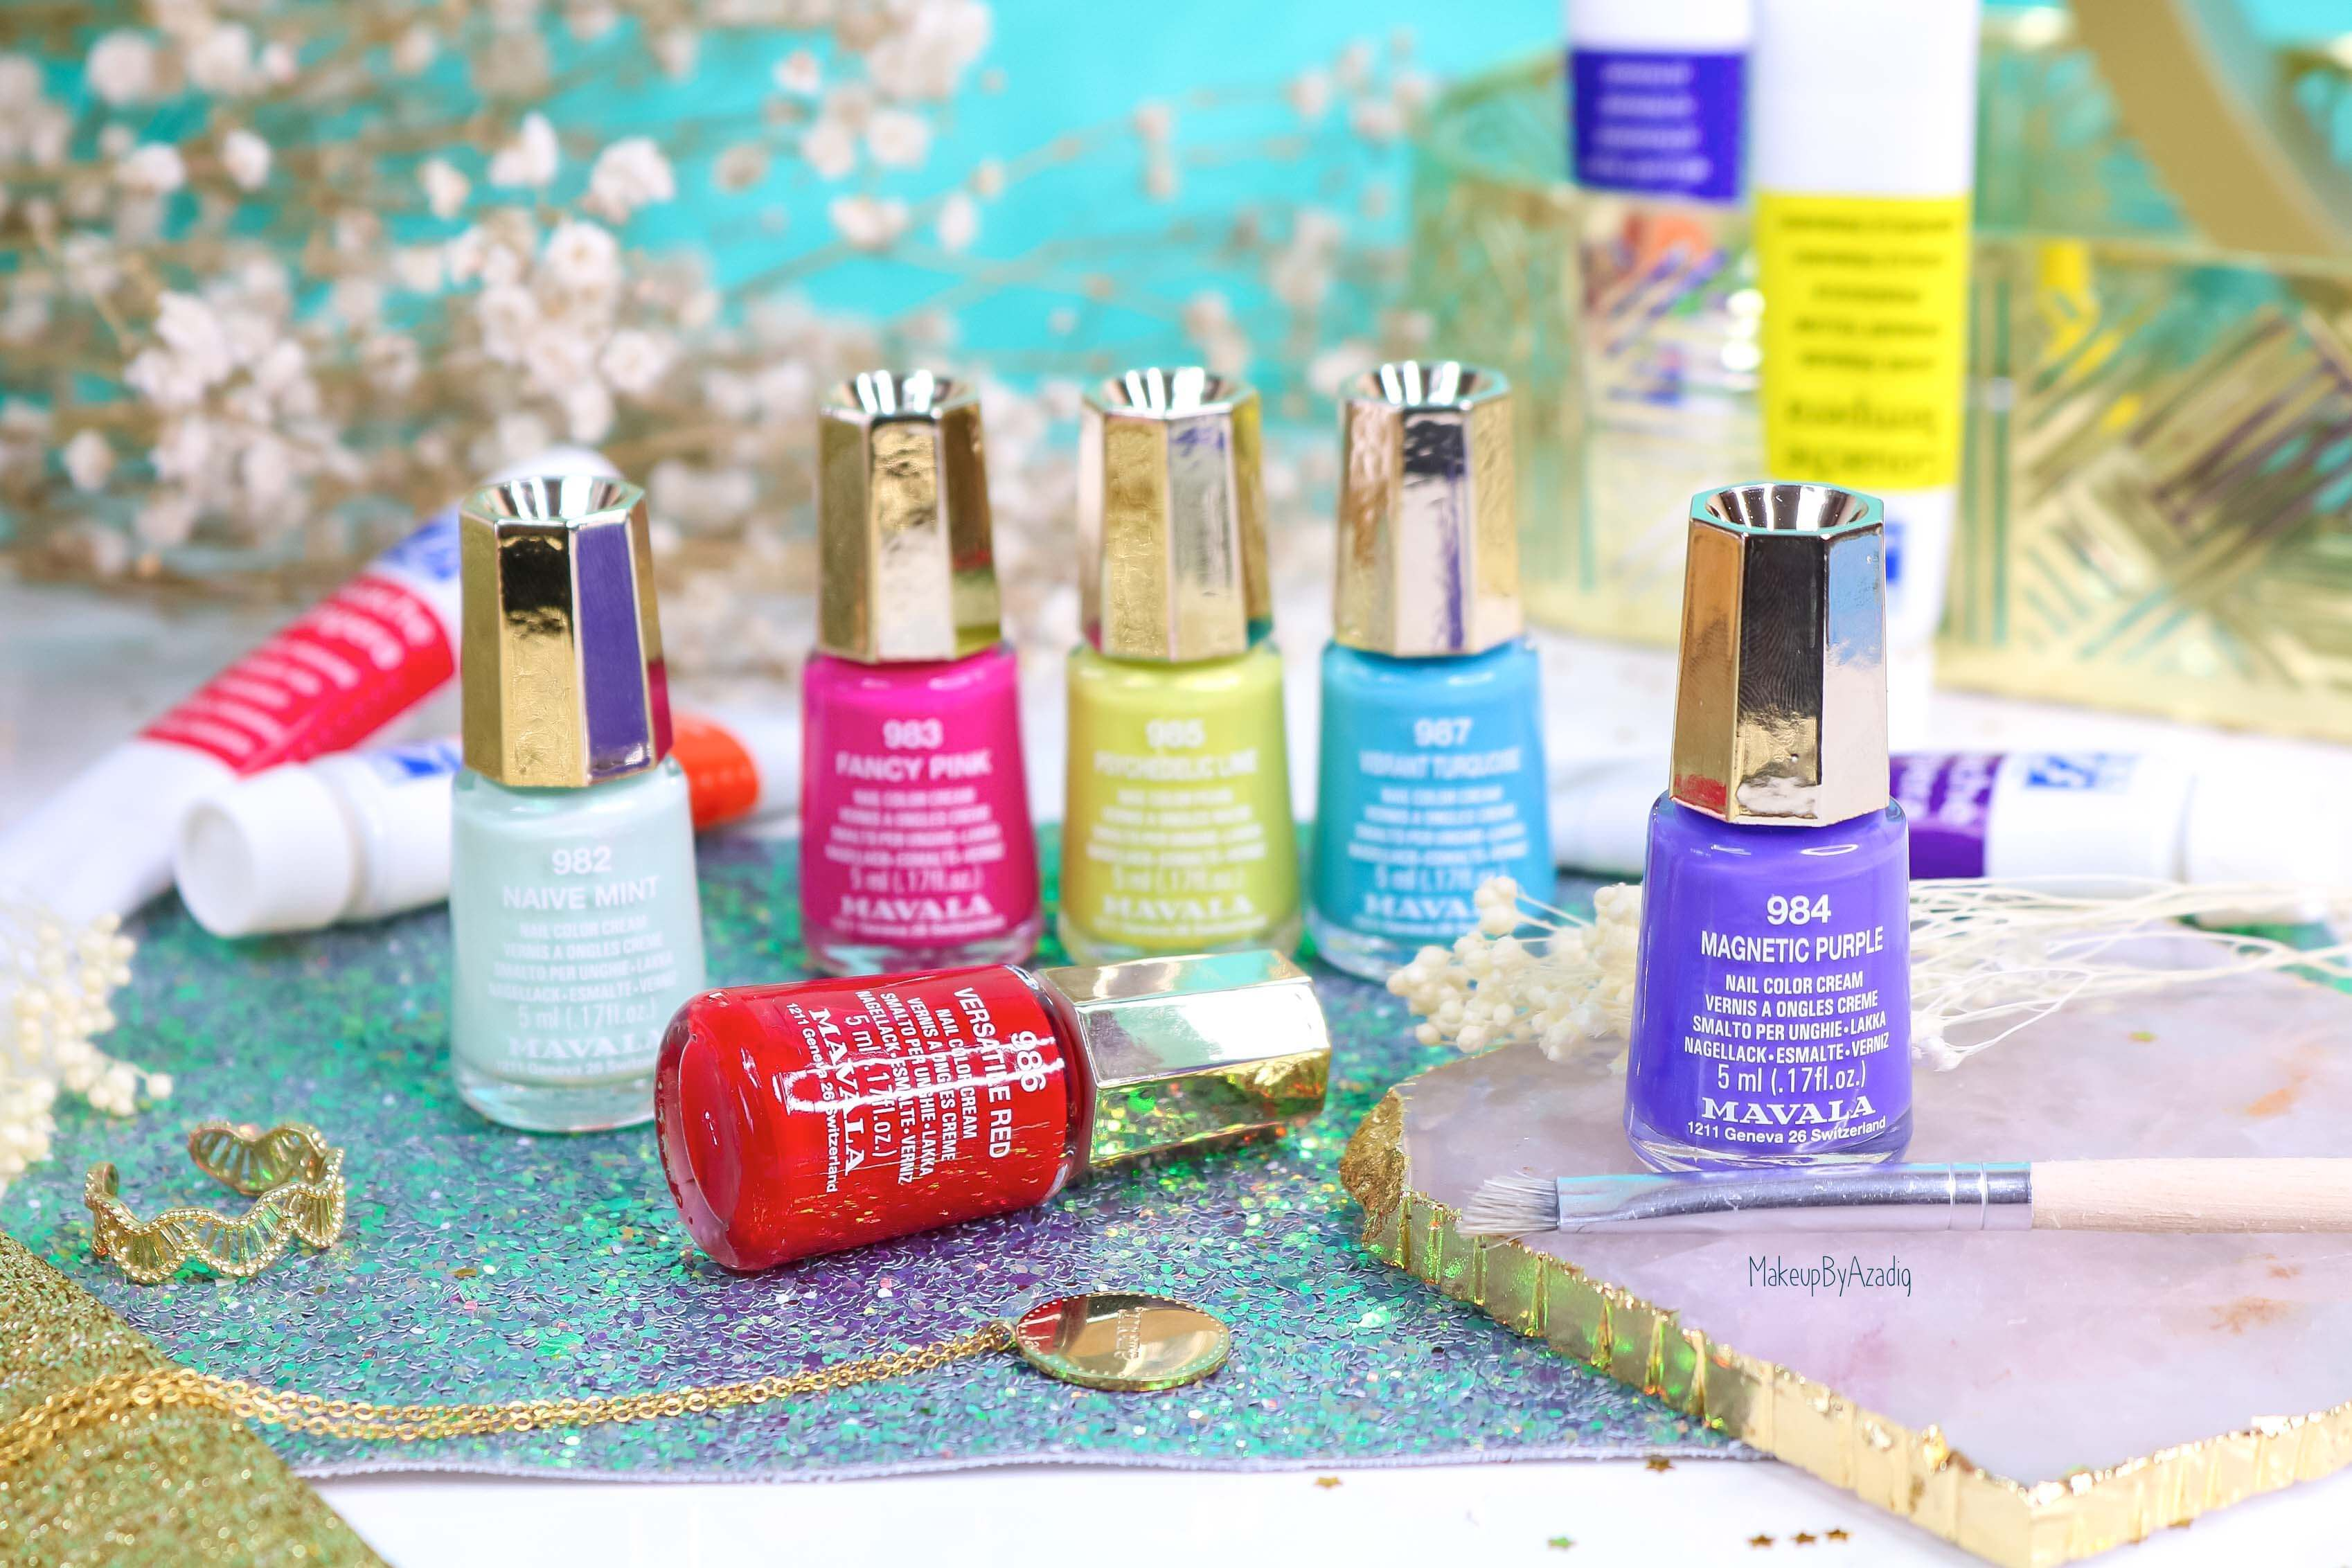 revue-collection-vernis-mavala-nails-dash-splash-ete-2019-bleu-orange-makeupbyazadig-swatch-avis-prix-collector